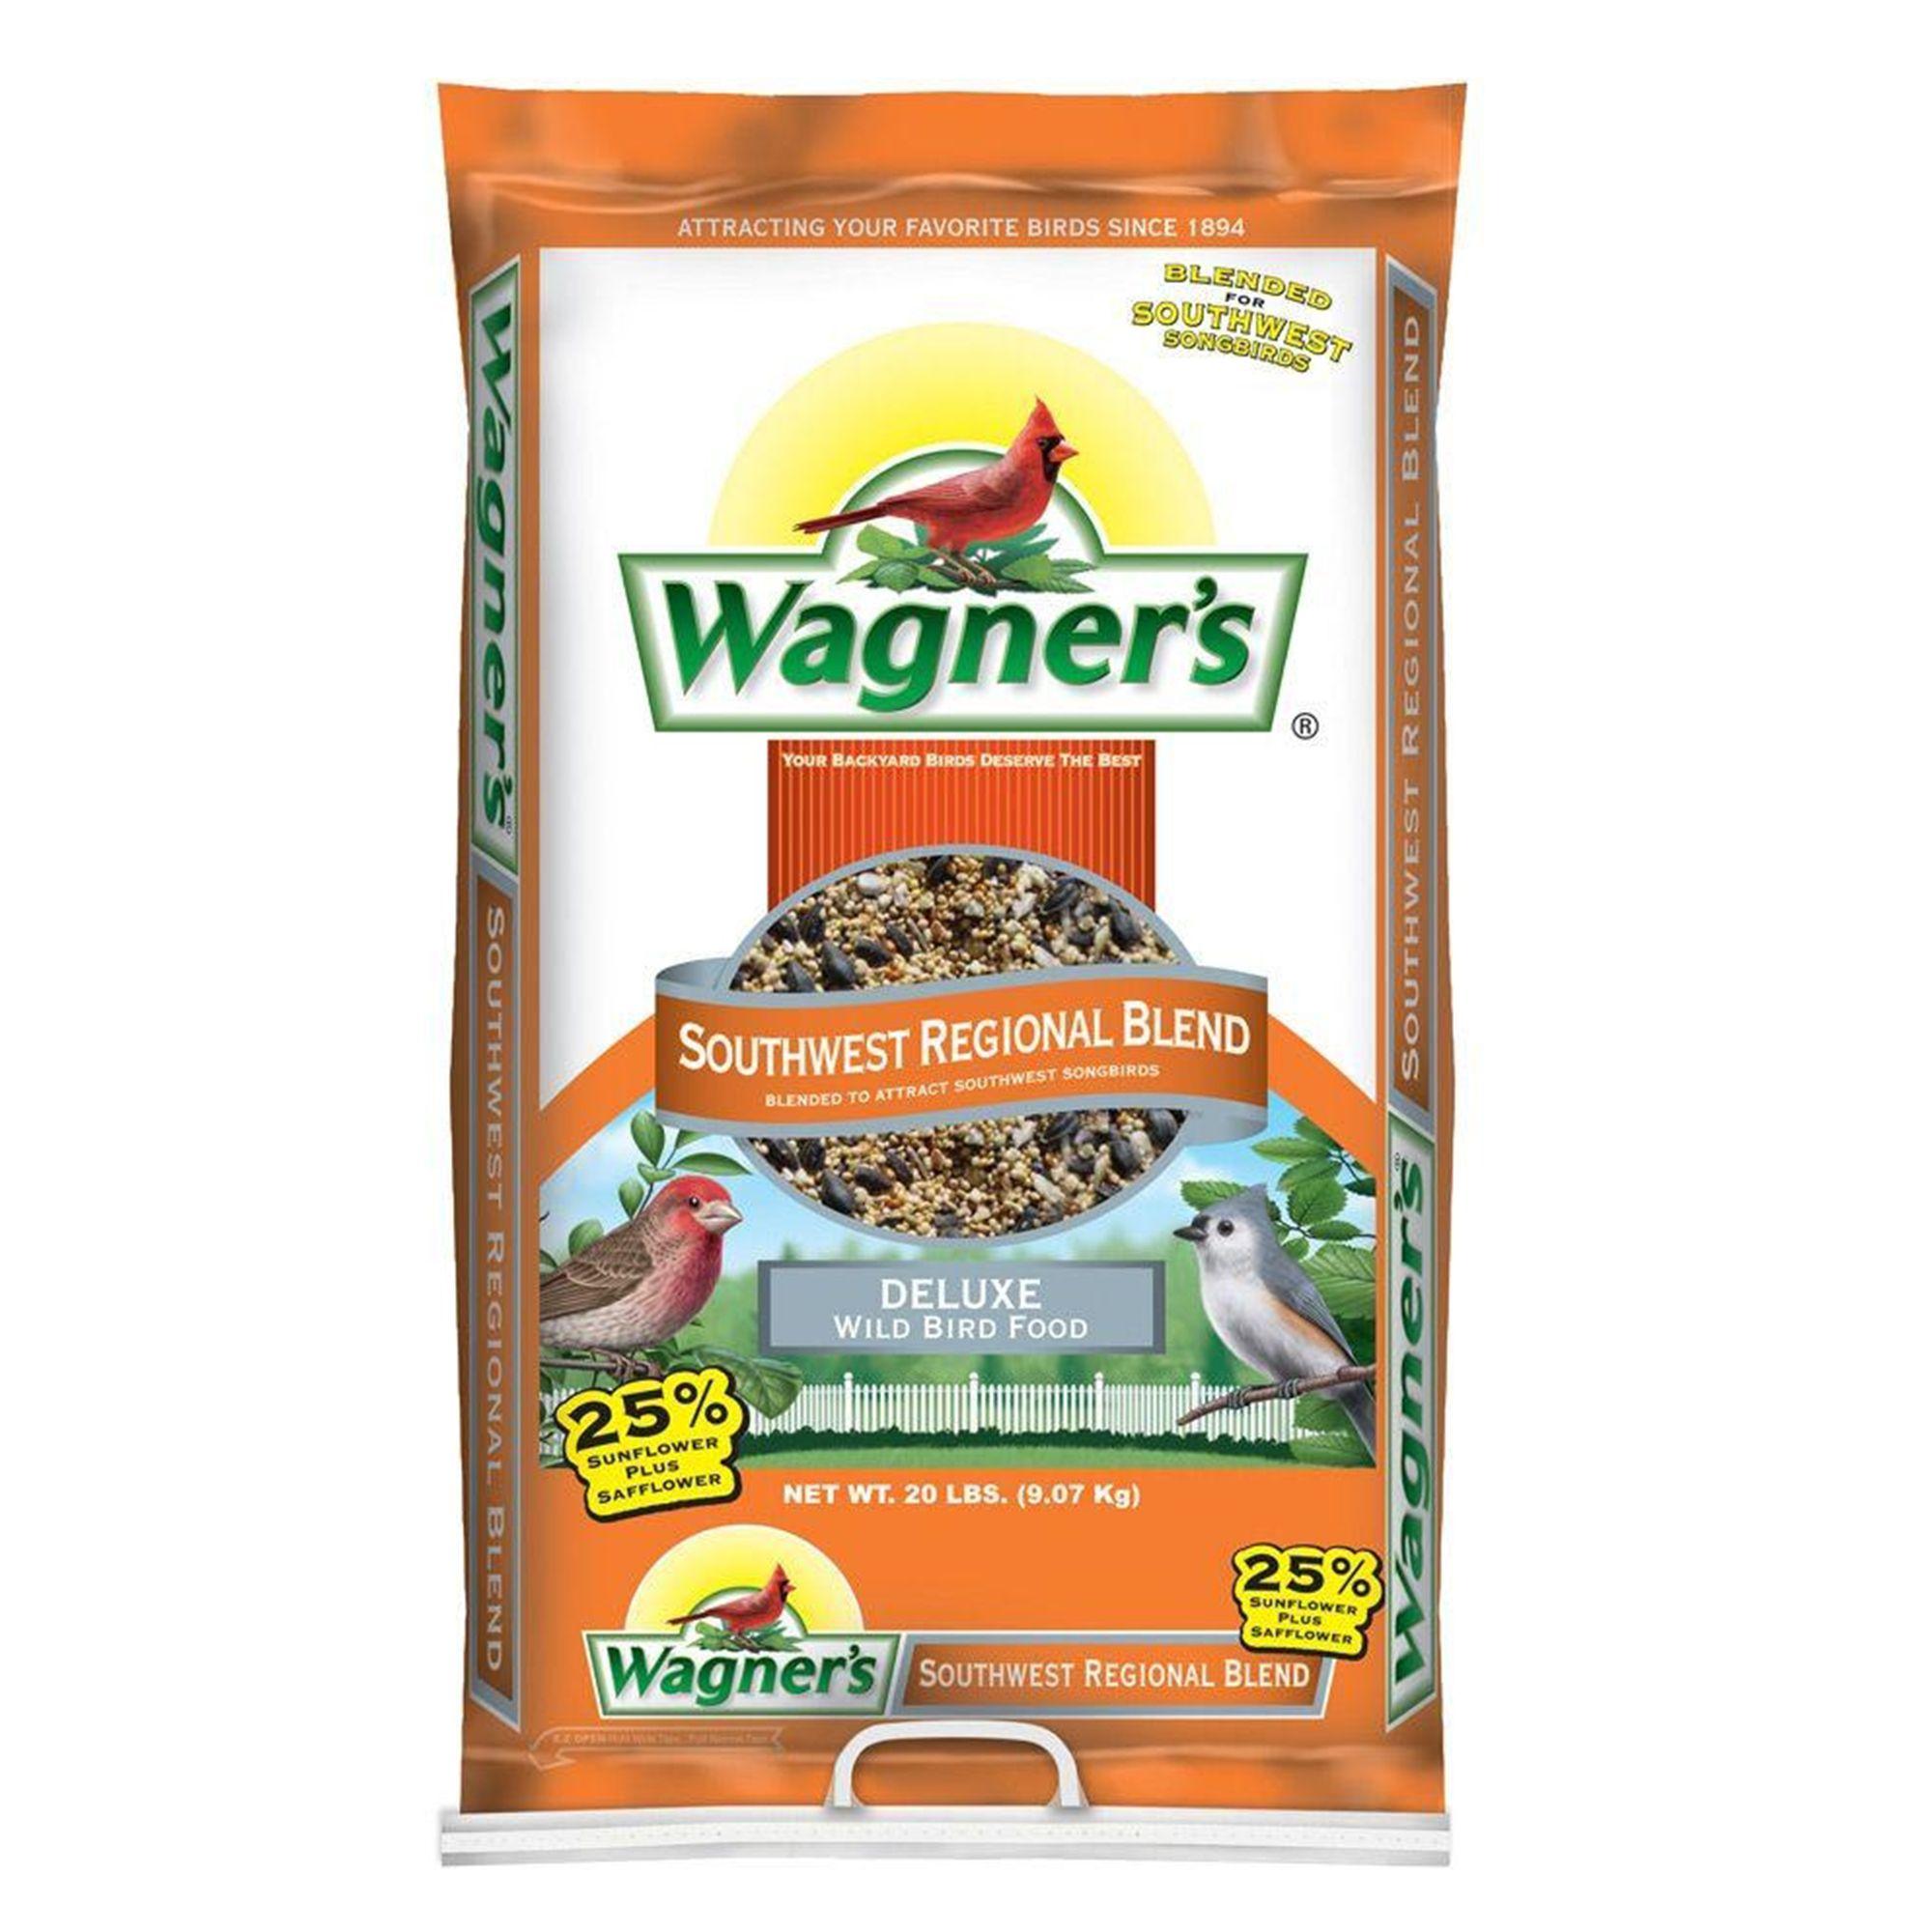 Wagner's Southwestern Regional Blend Wild Bird Seed size: 20 Lb, Wagners, Grain, Grain Products 5271544